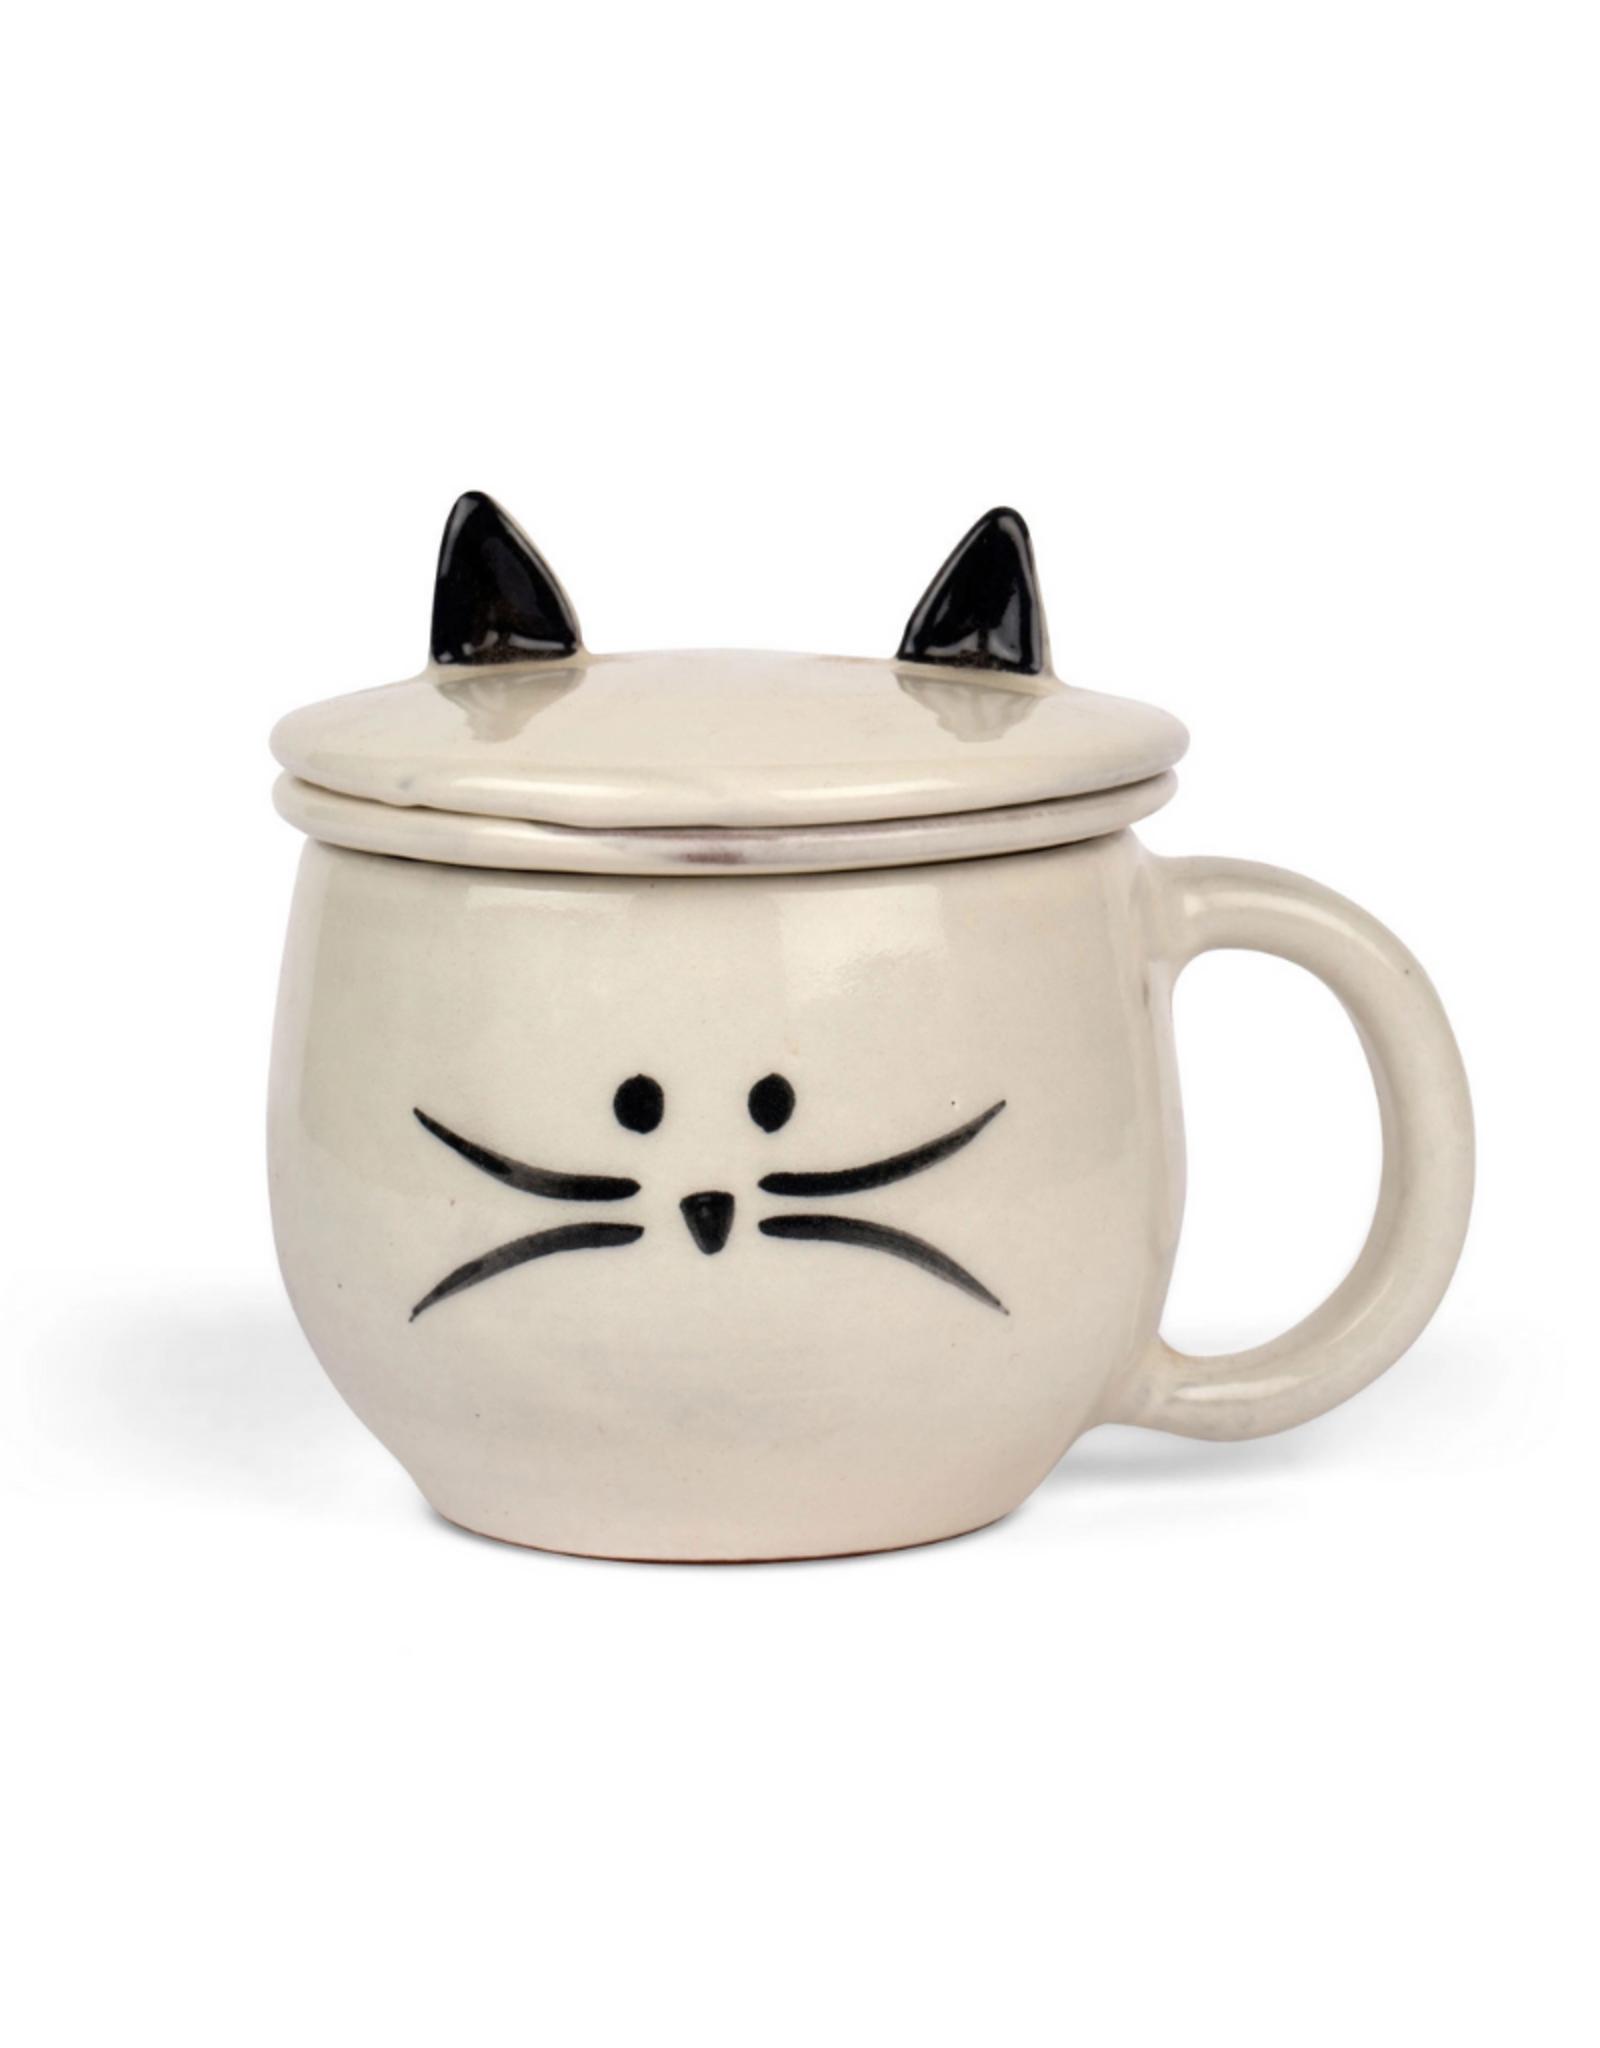 Ten Thousand Villages USA Mug Meow and Tea Strainer